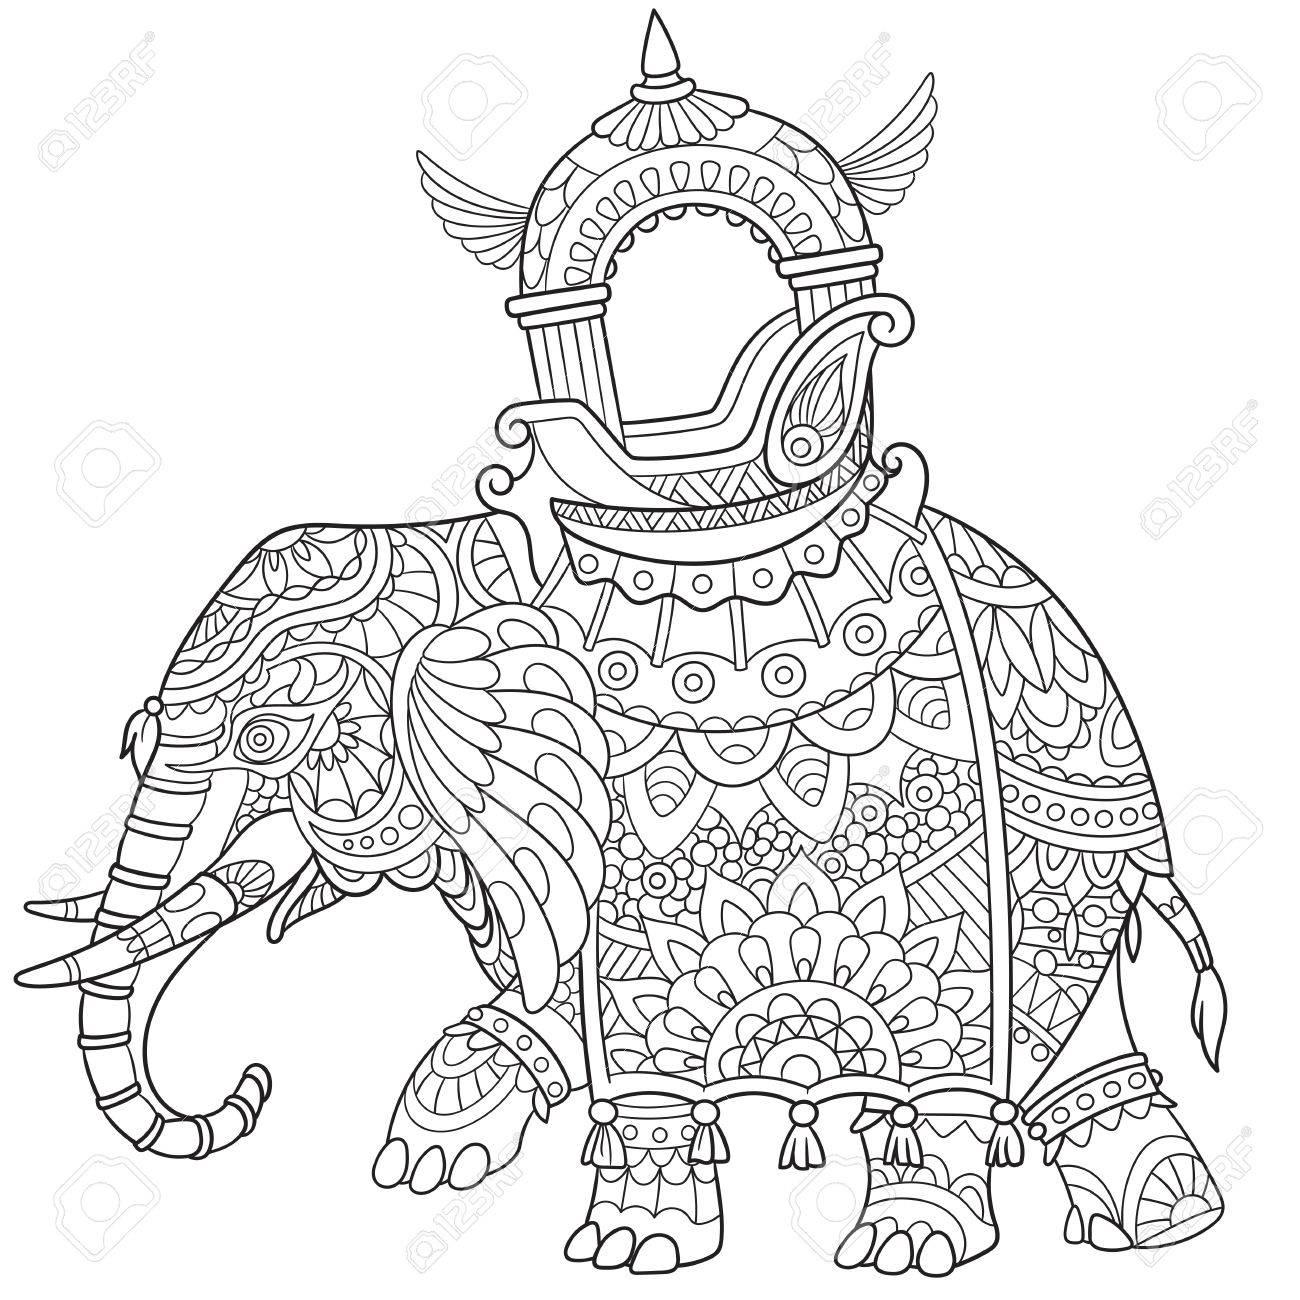 Elefante De Dibujos Animados, Aislado En Fondo Blanco. Boceto Para ...